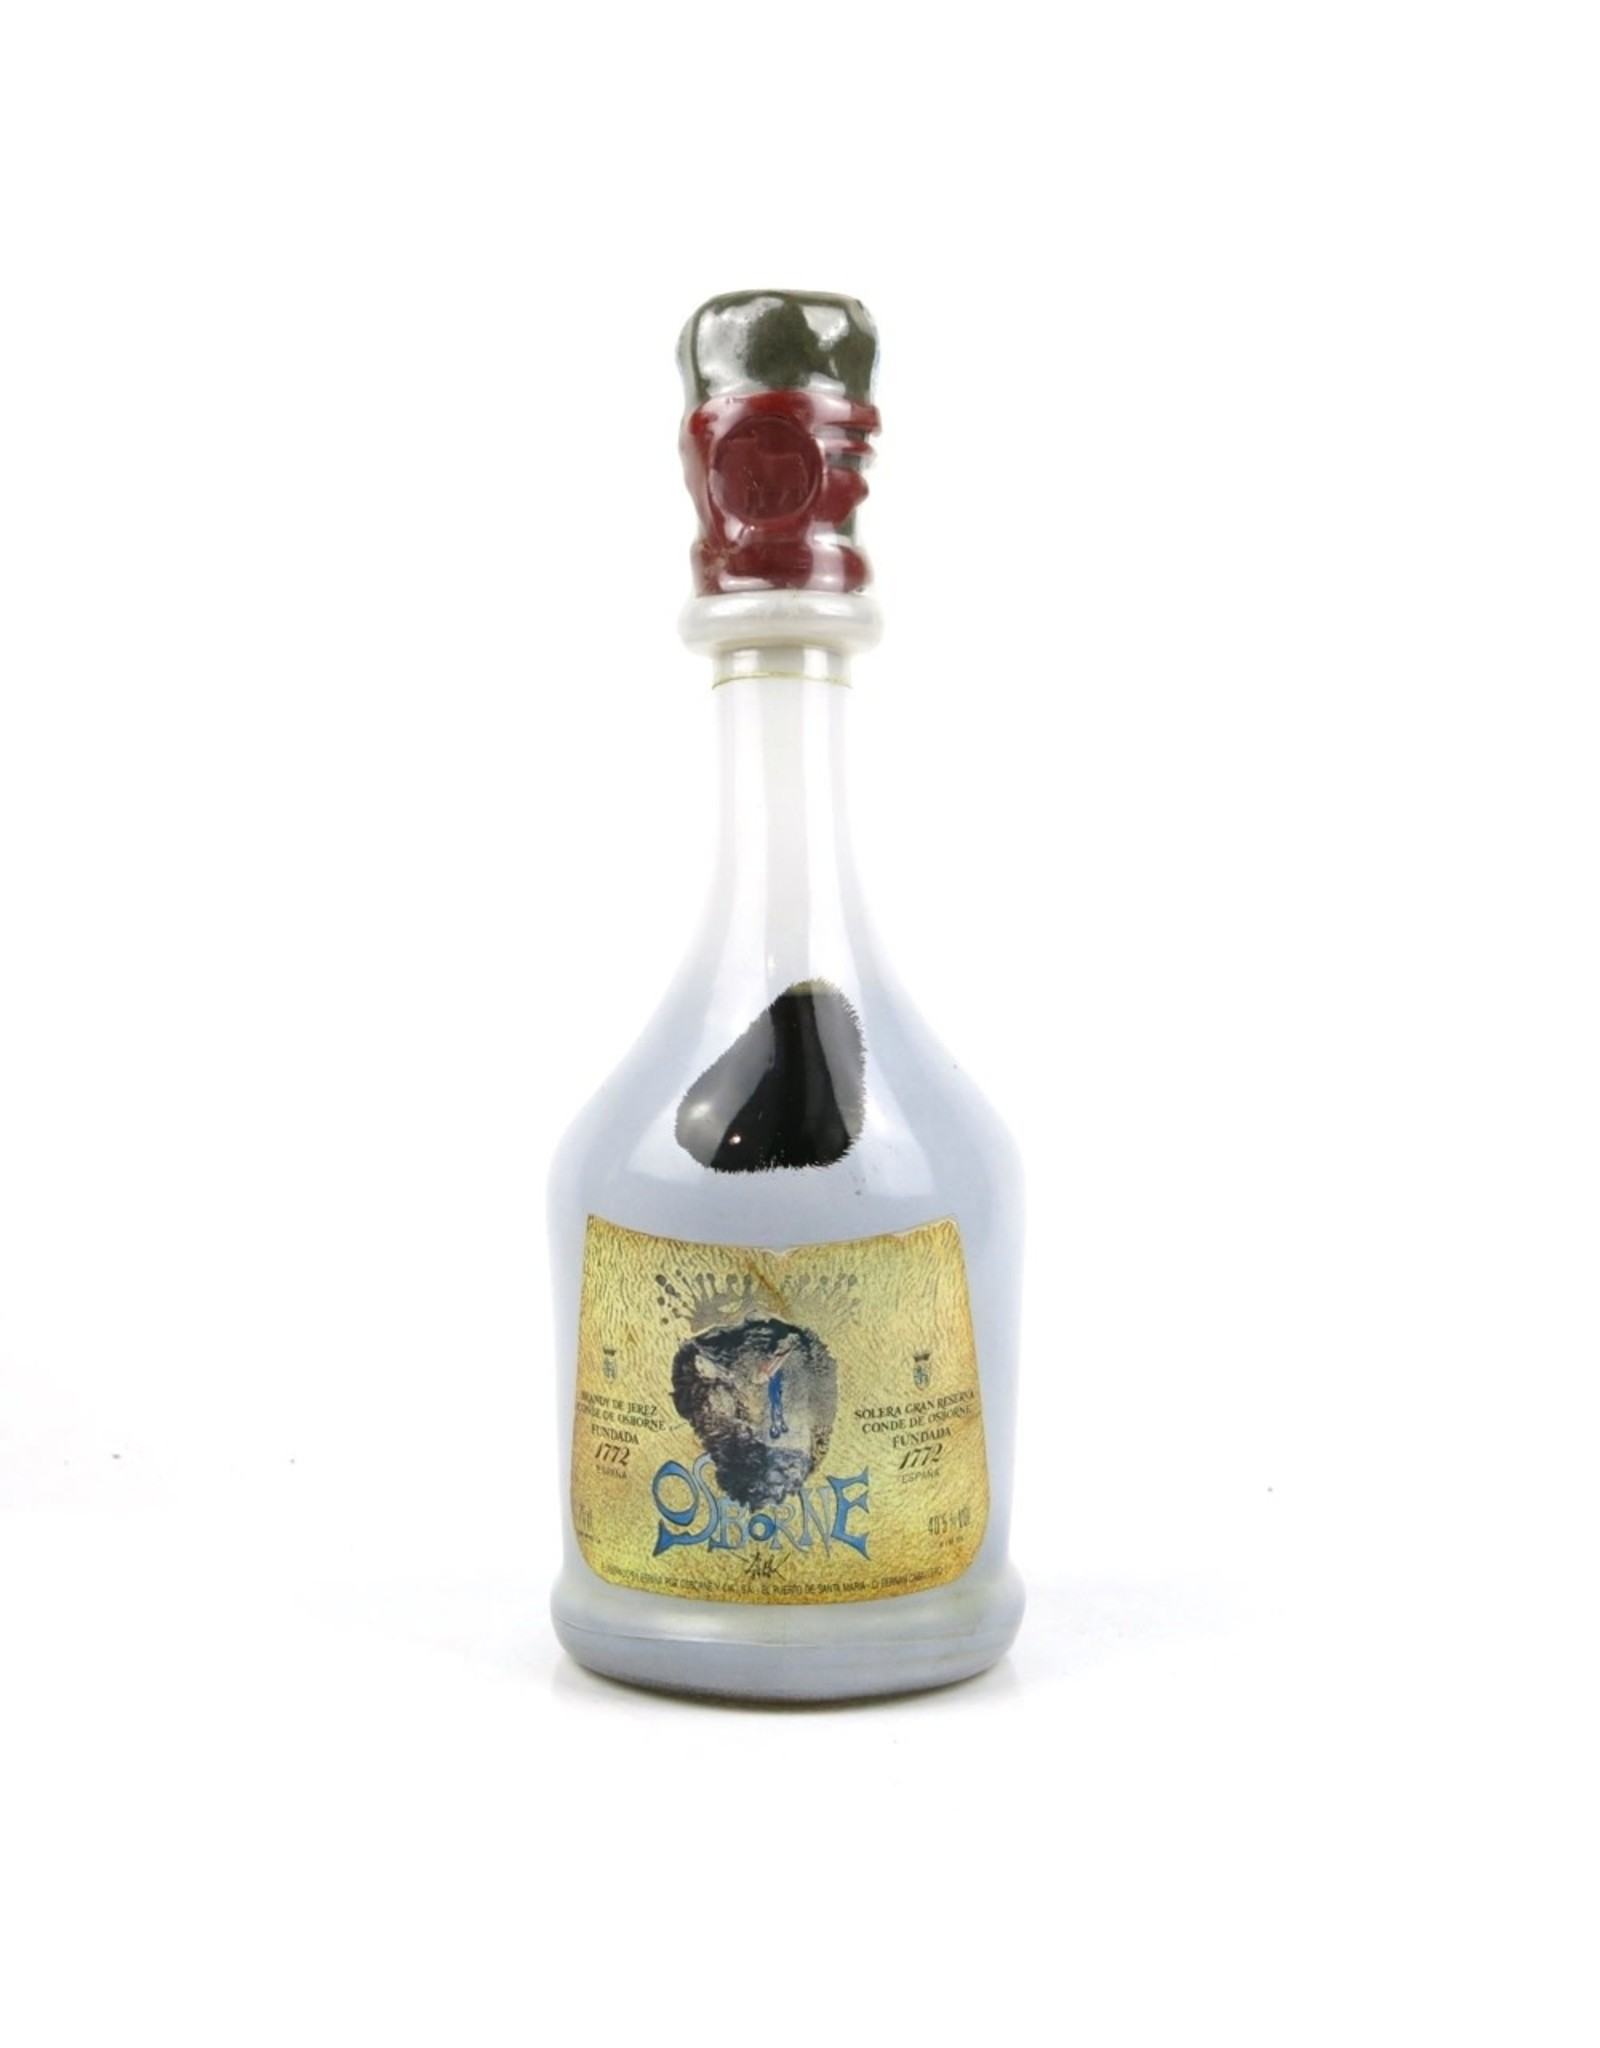 Brandy Conde de Osborne Solera Gran Reserva Brandy Dali (Bottled Late 1960s)